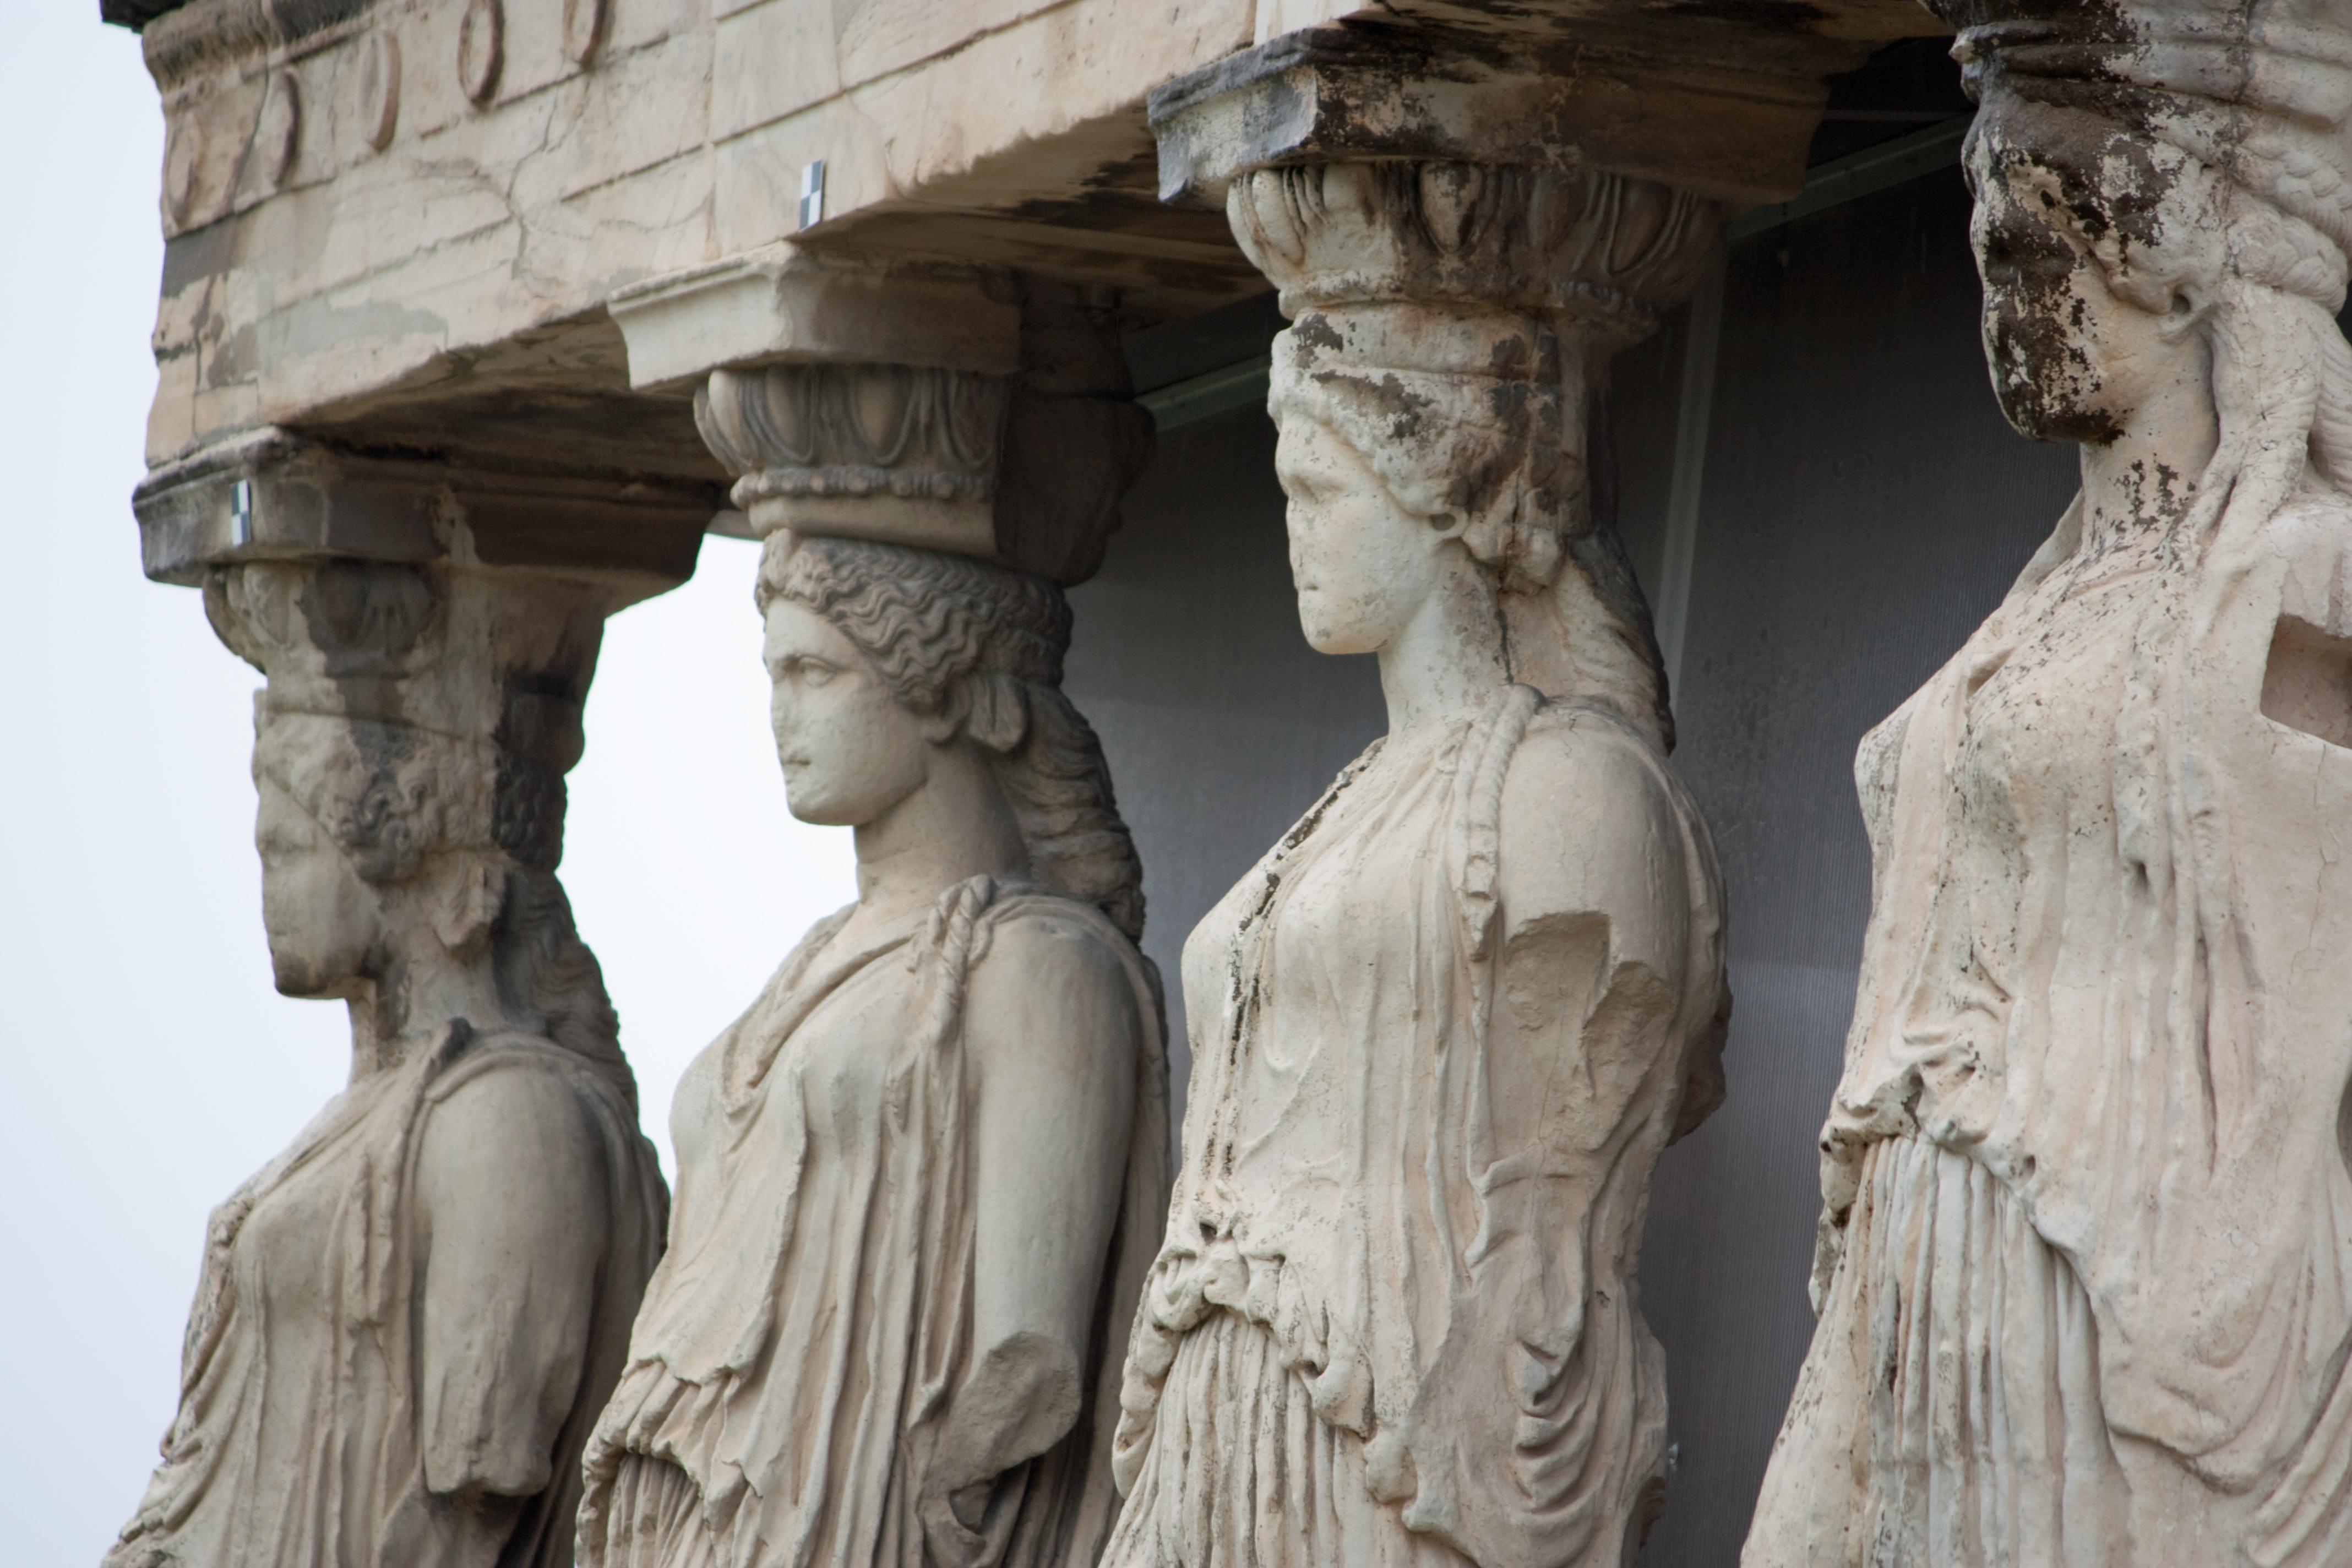 андромеды один статуи греция картинки когда при общении